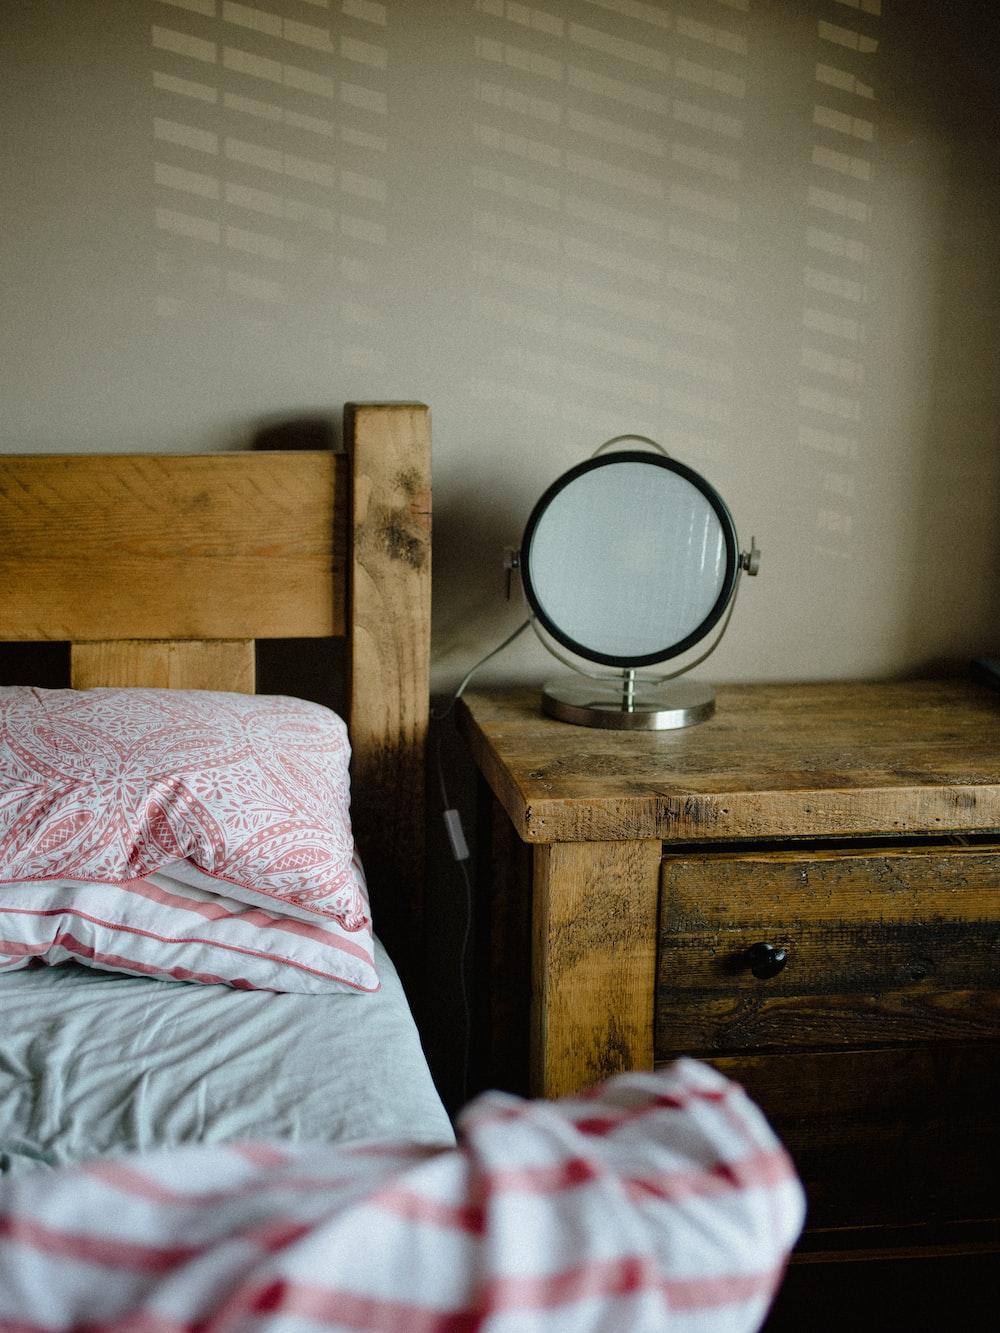 table lamp on nightstand